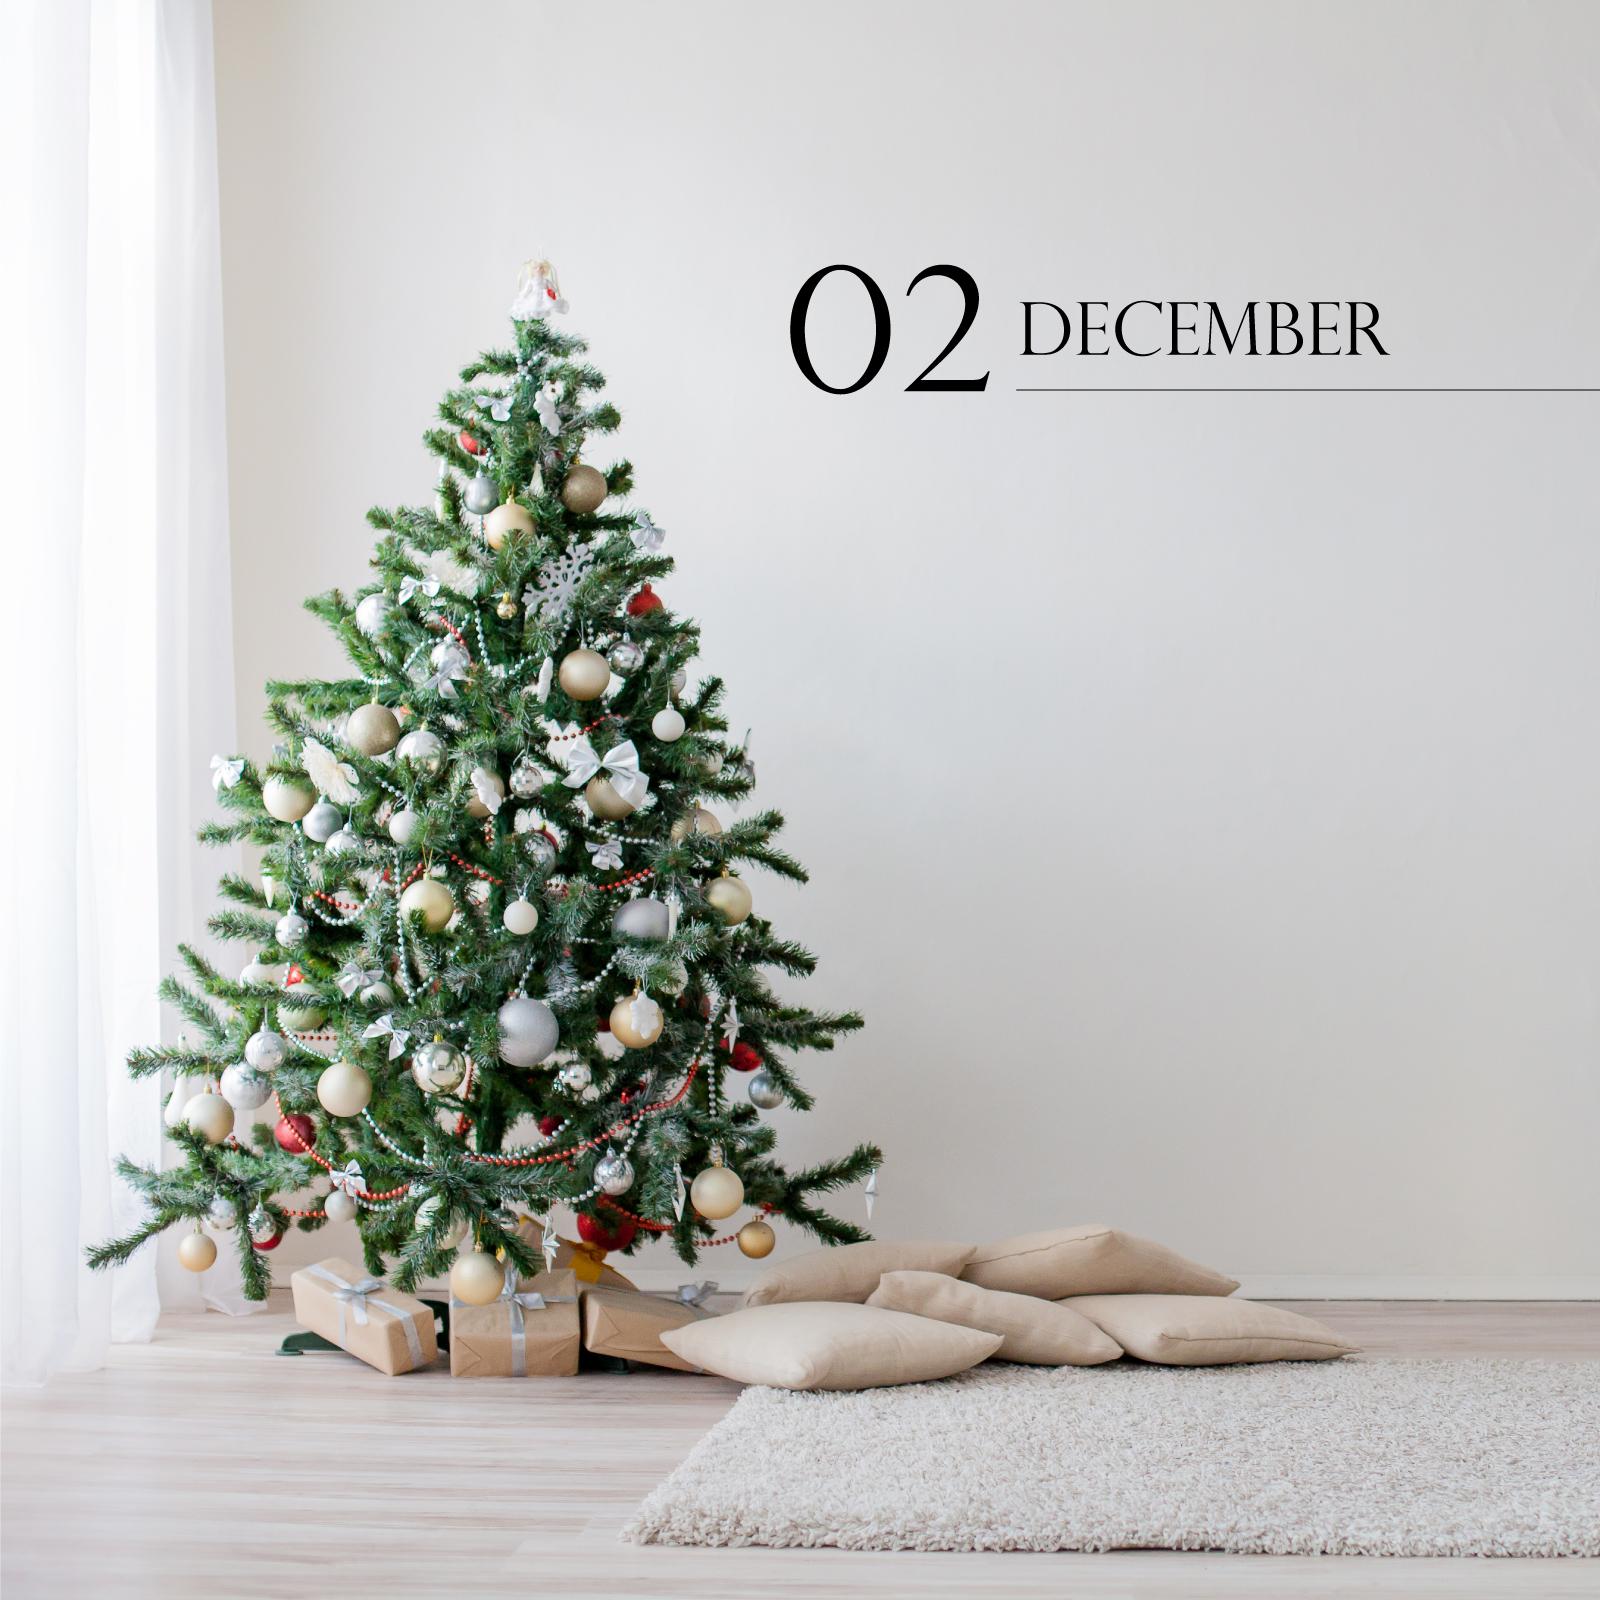 2 december